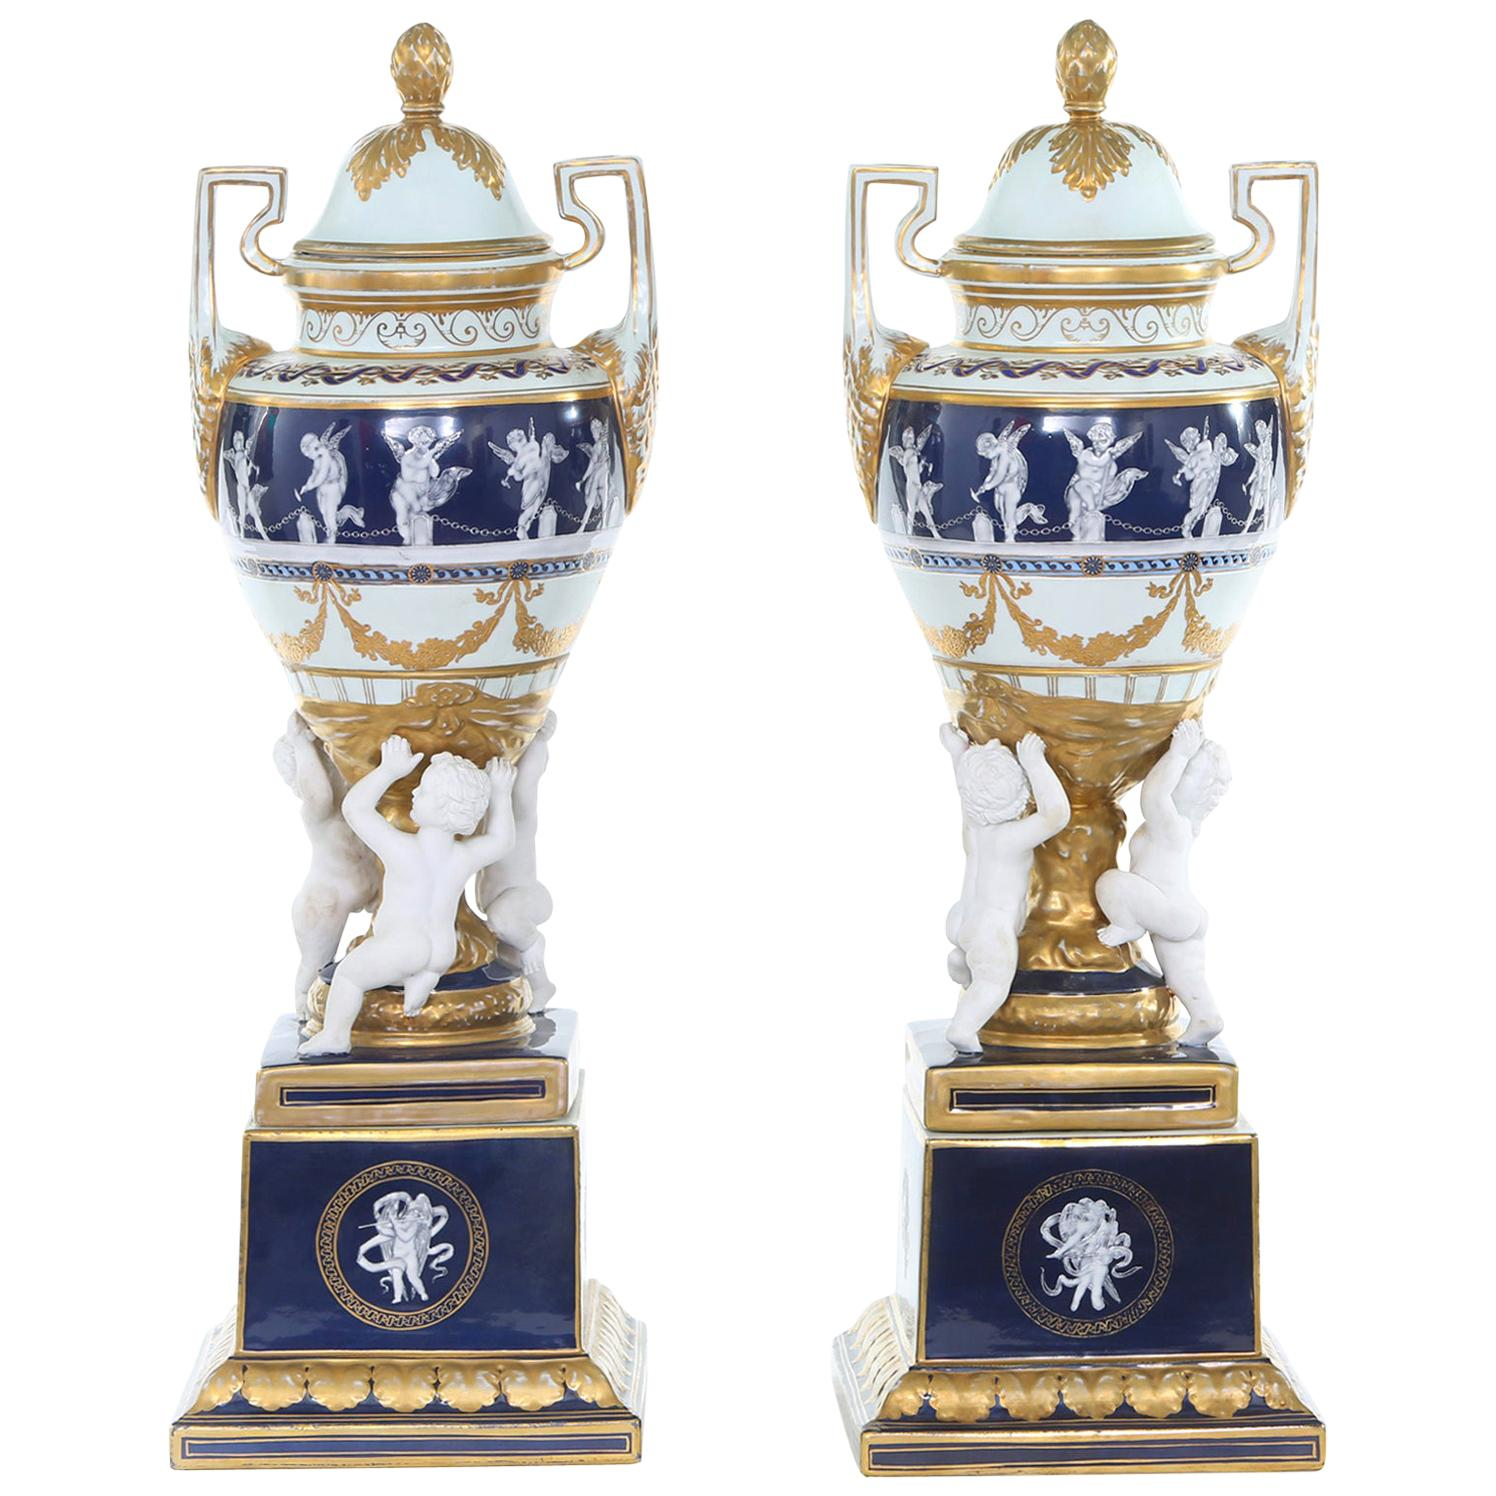 Large 19th Century Gilt Gold / Minton Porcelain Covered Urns